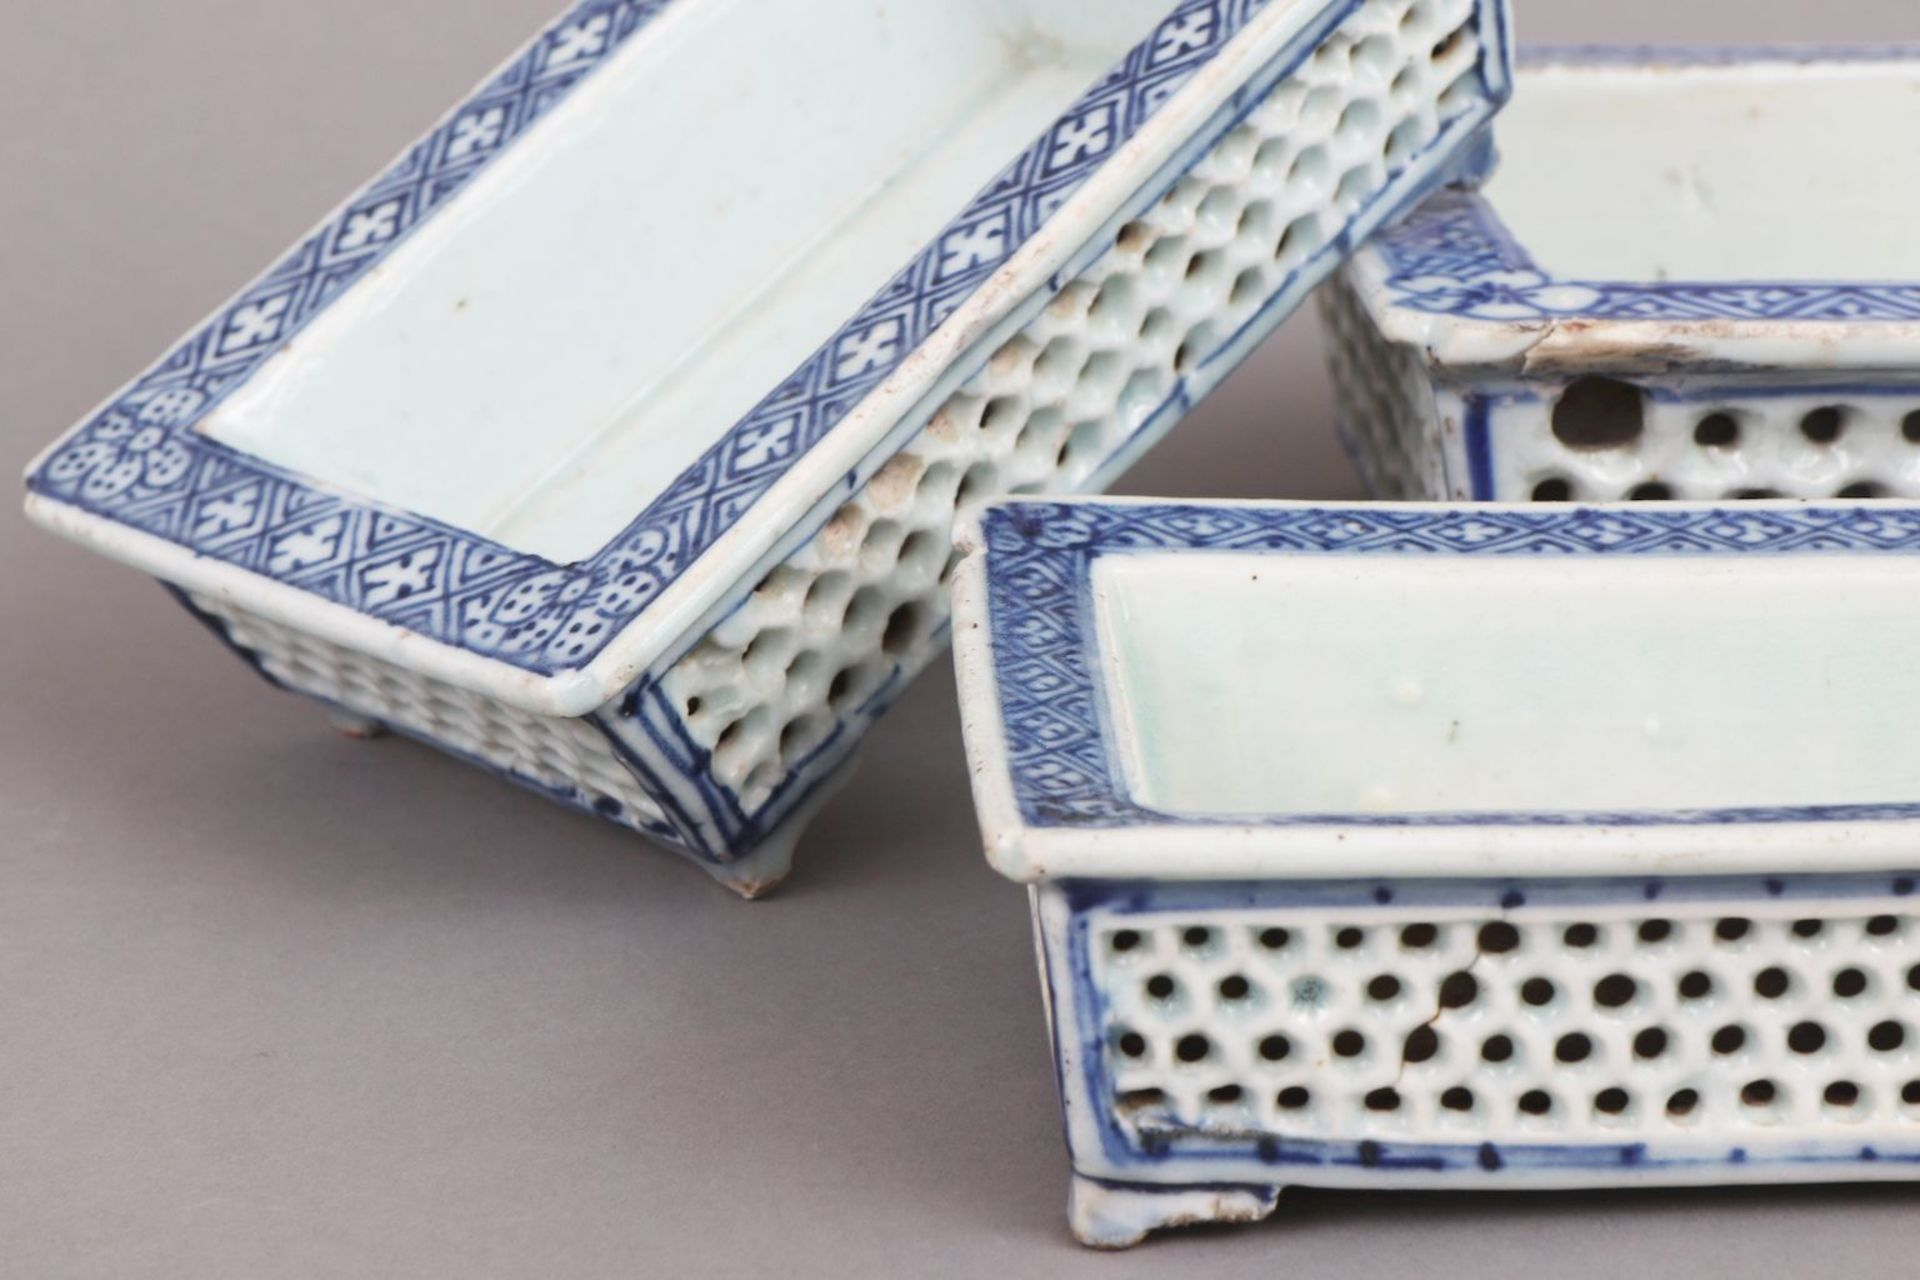 3 chinesische Bonsai-Pflanzschalen - Image 2 of 4